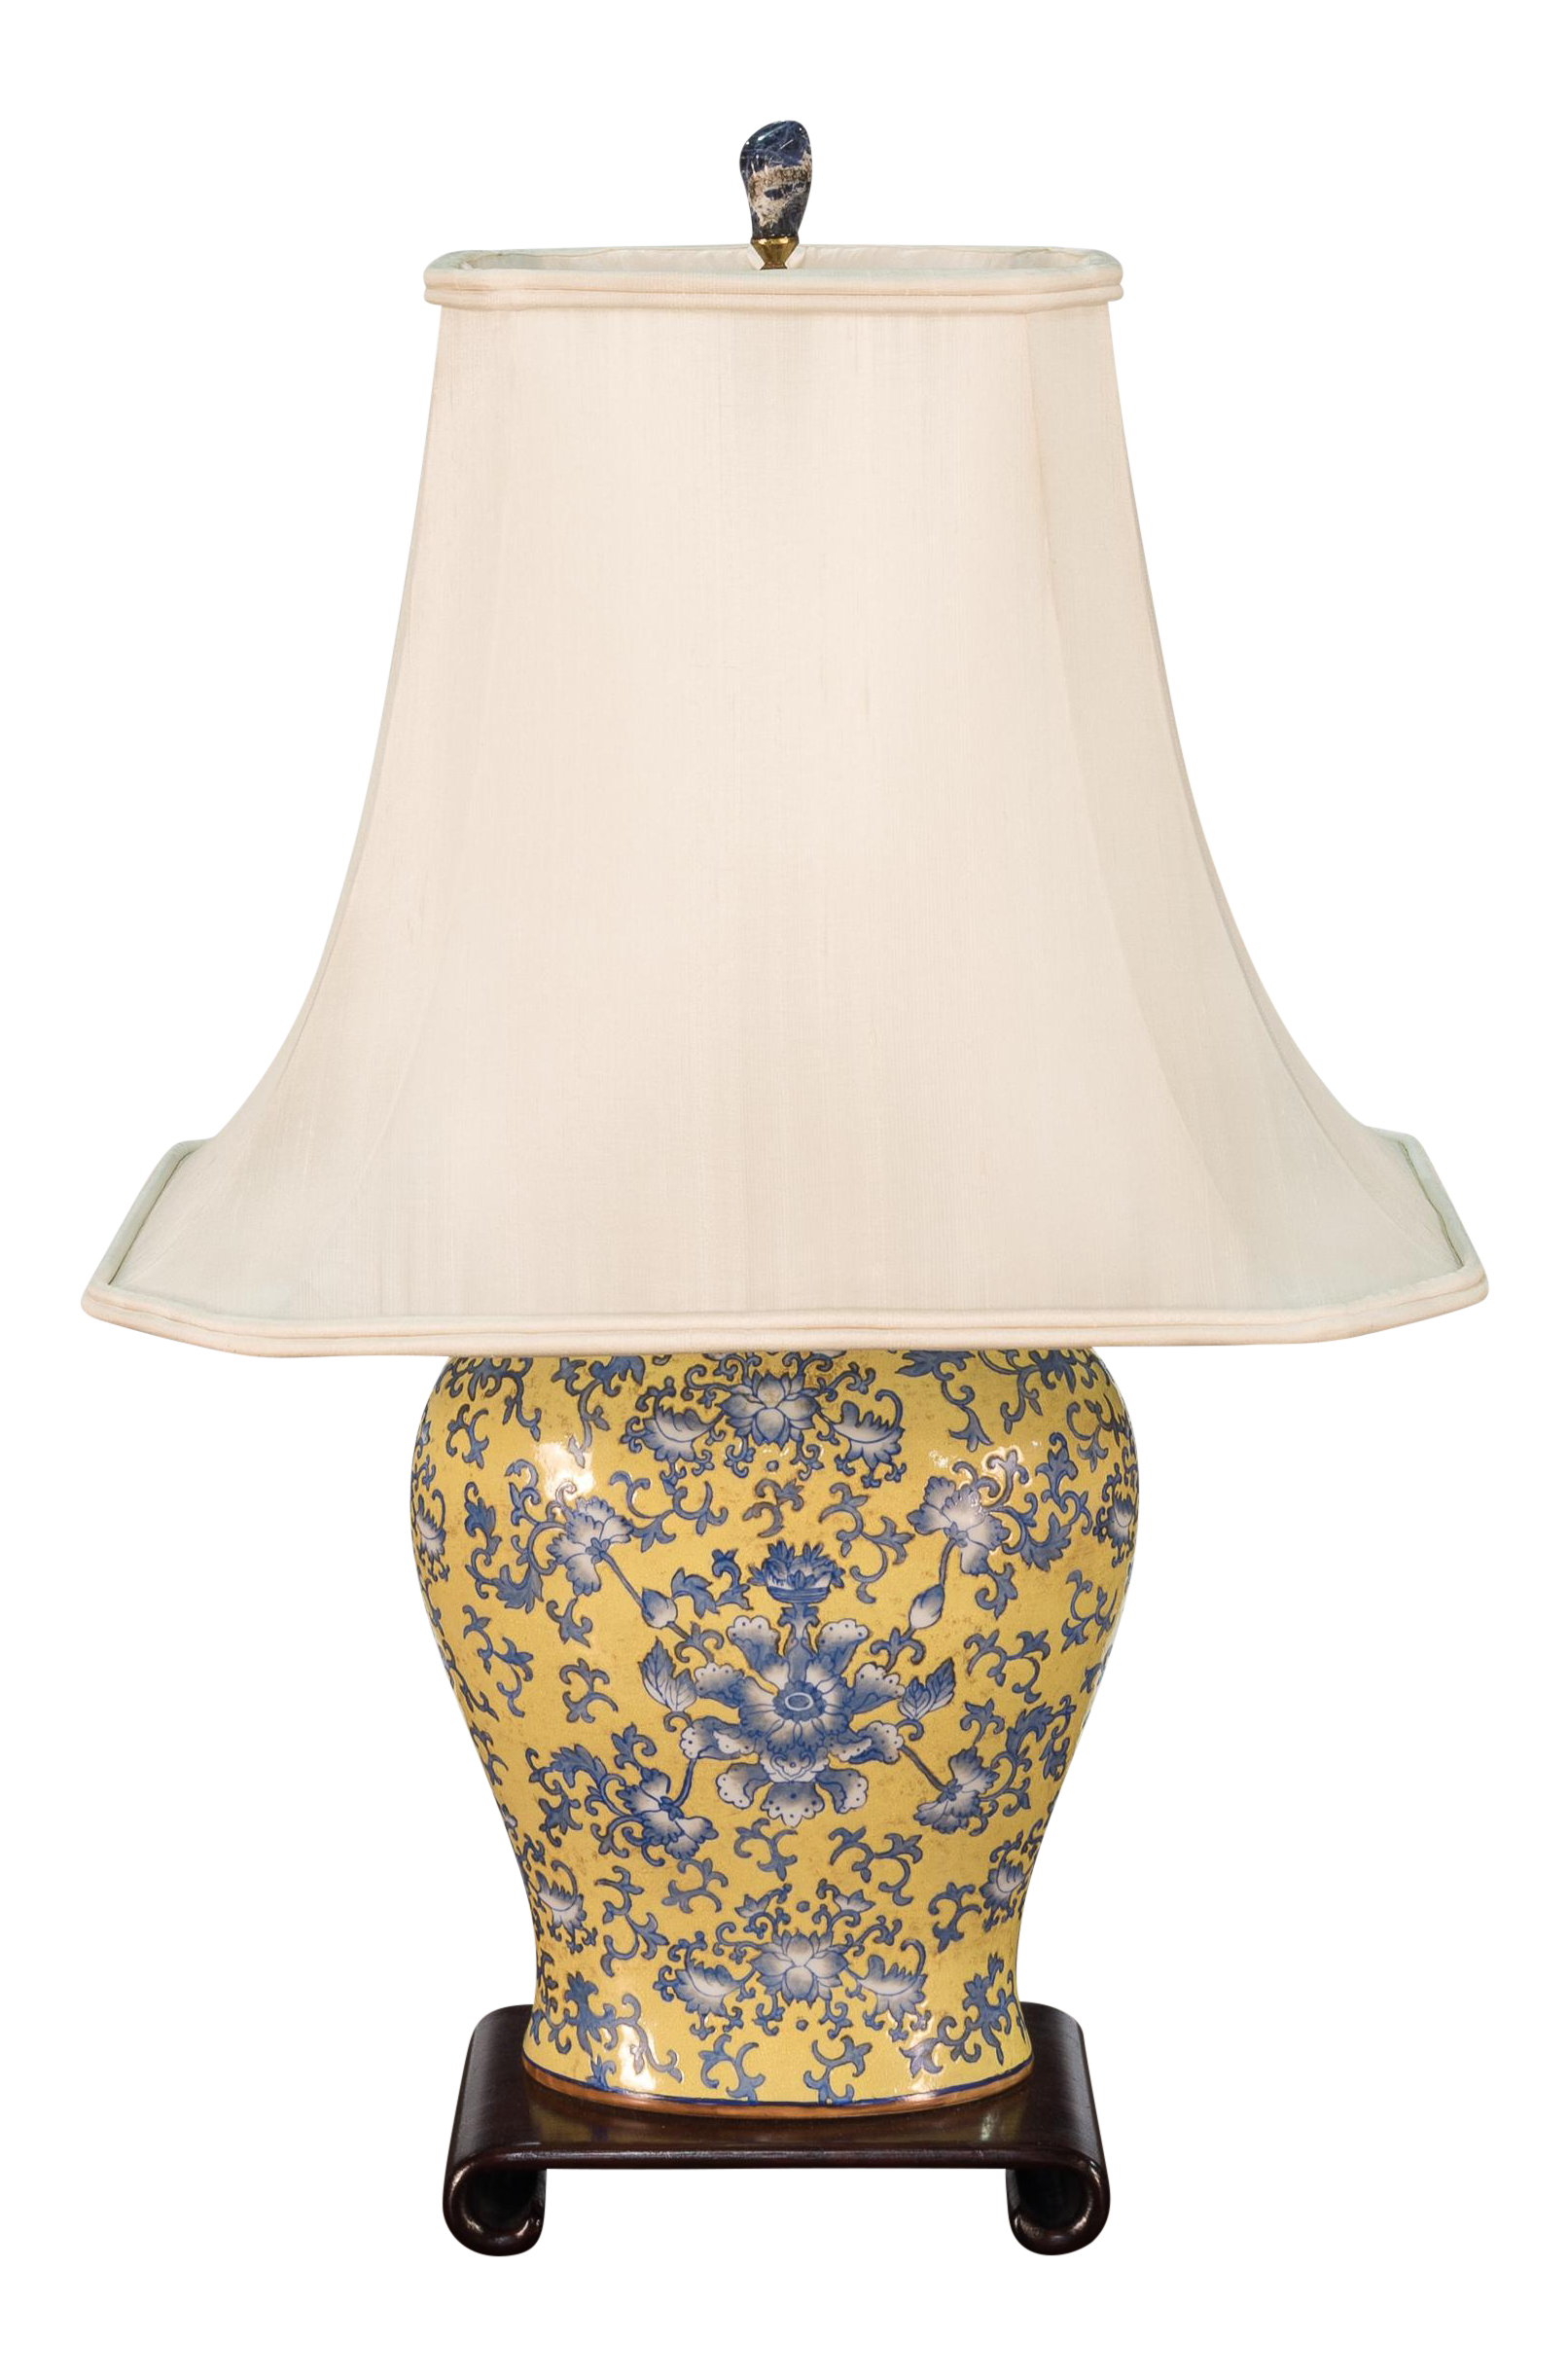 Vintage Sarreid Ltd Porcelain Ginger Jar Lamp On Chairish Com